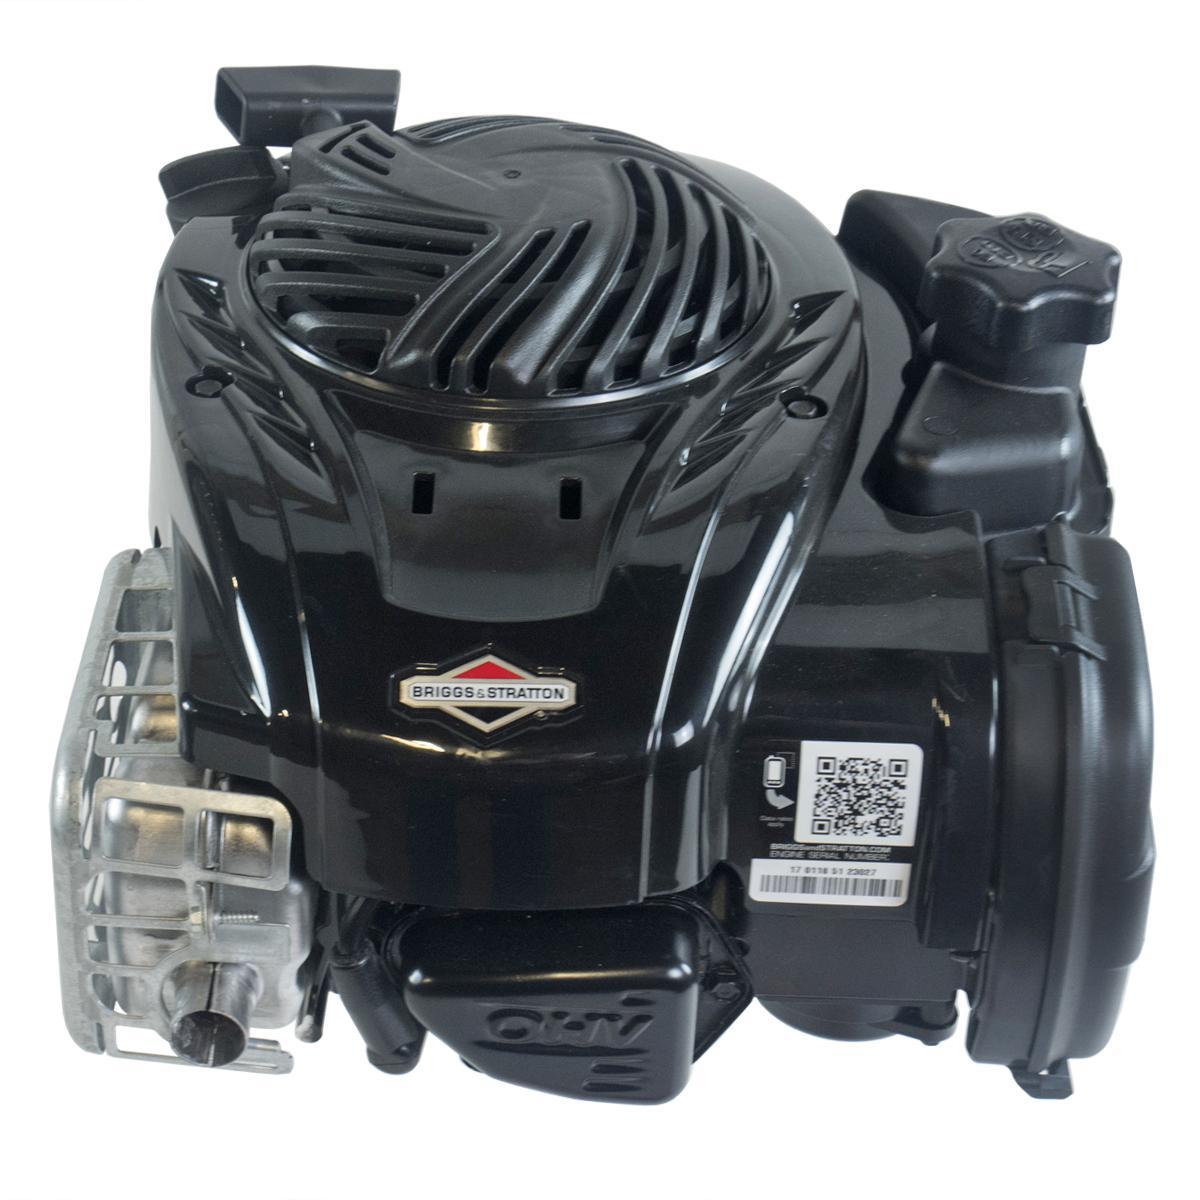 550 Series, Vertical 7/8x3-5/32 Shaft, Fixed Throttle, Ready Start, Briggs & Stratton Engine